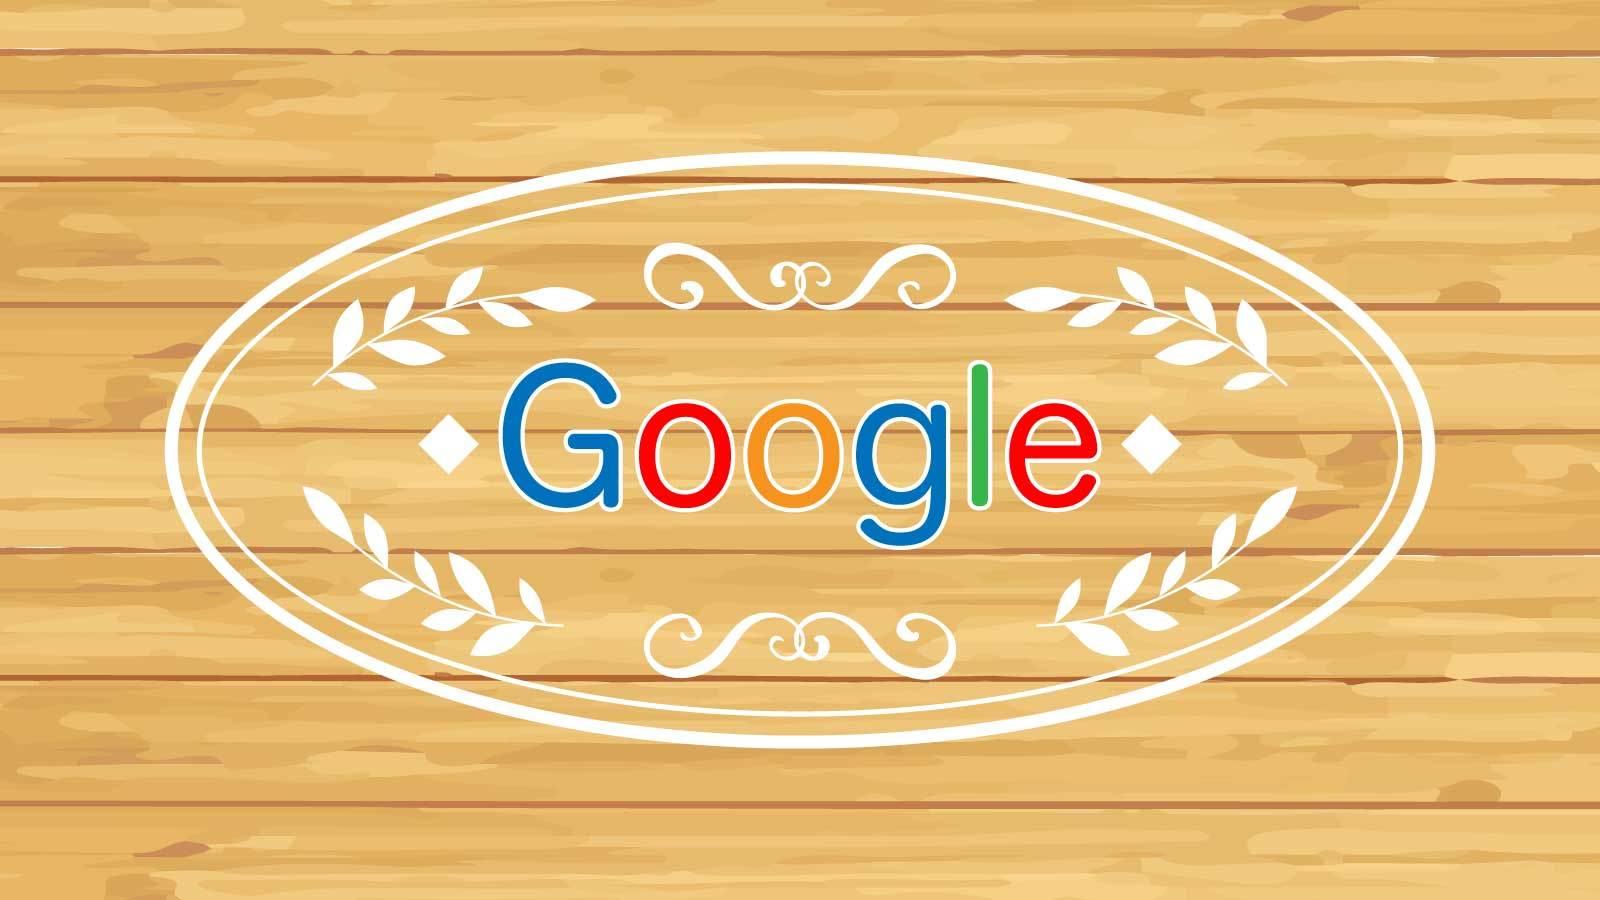 Google日本語フォントの正しい使い方